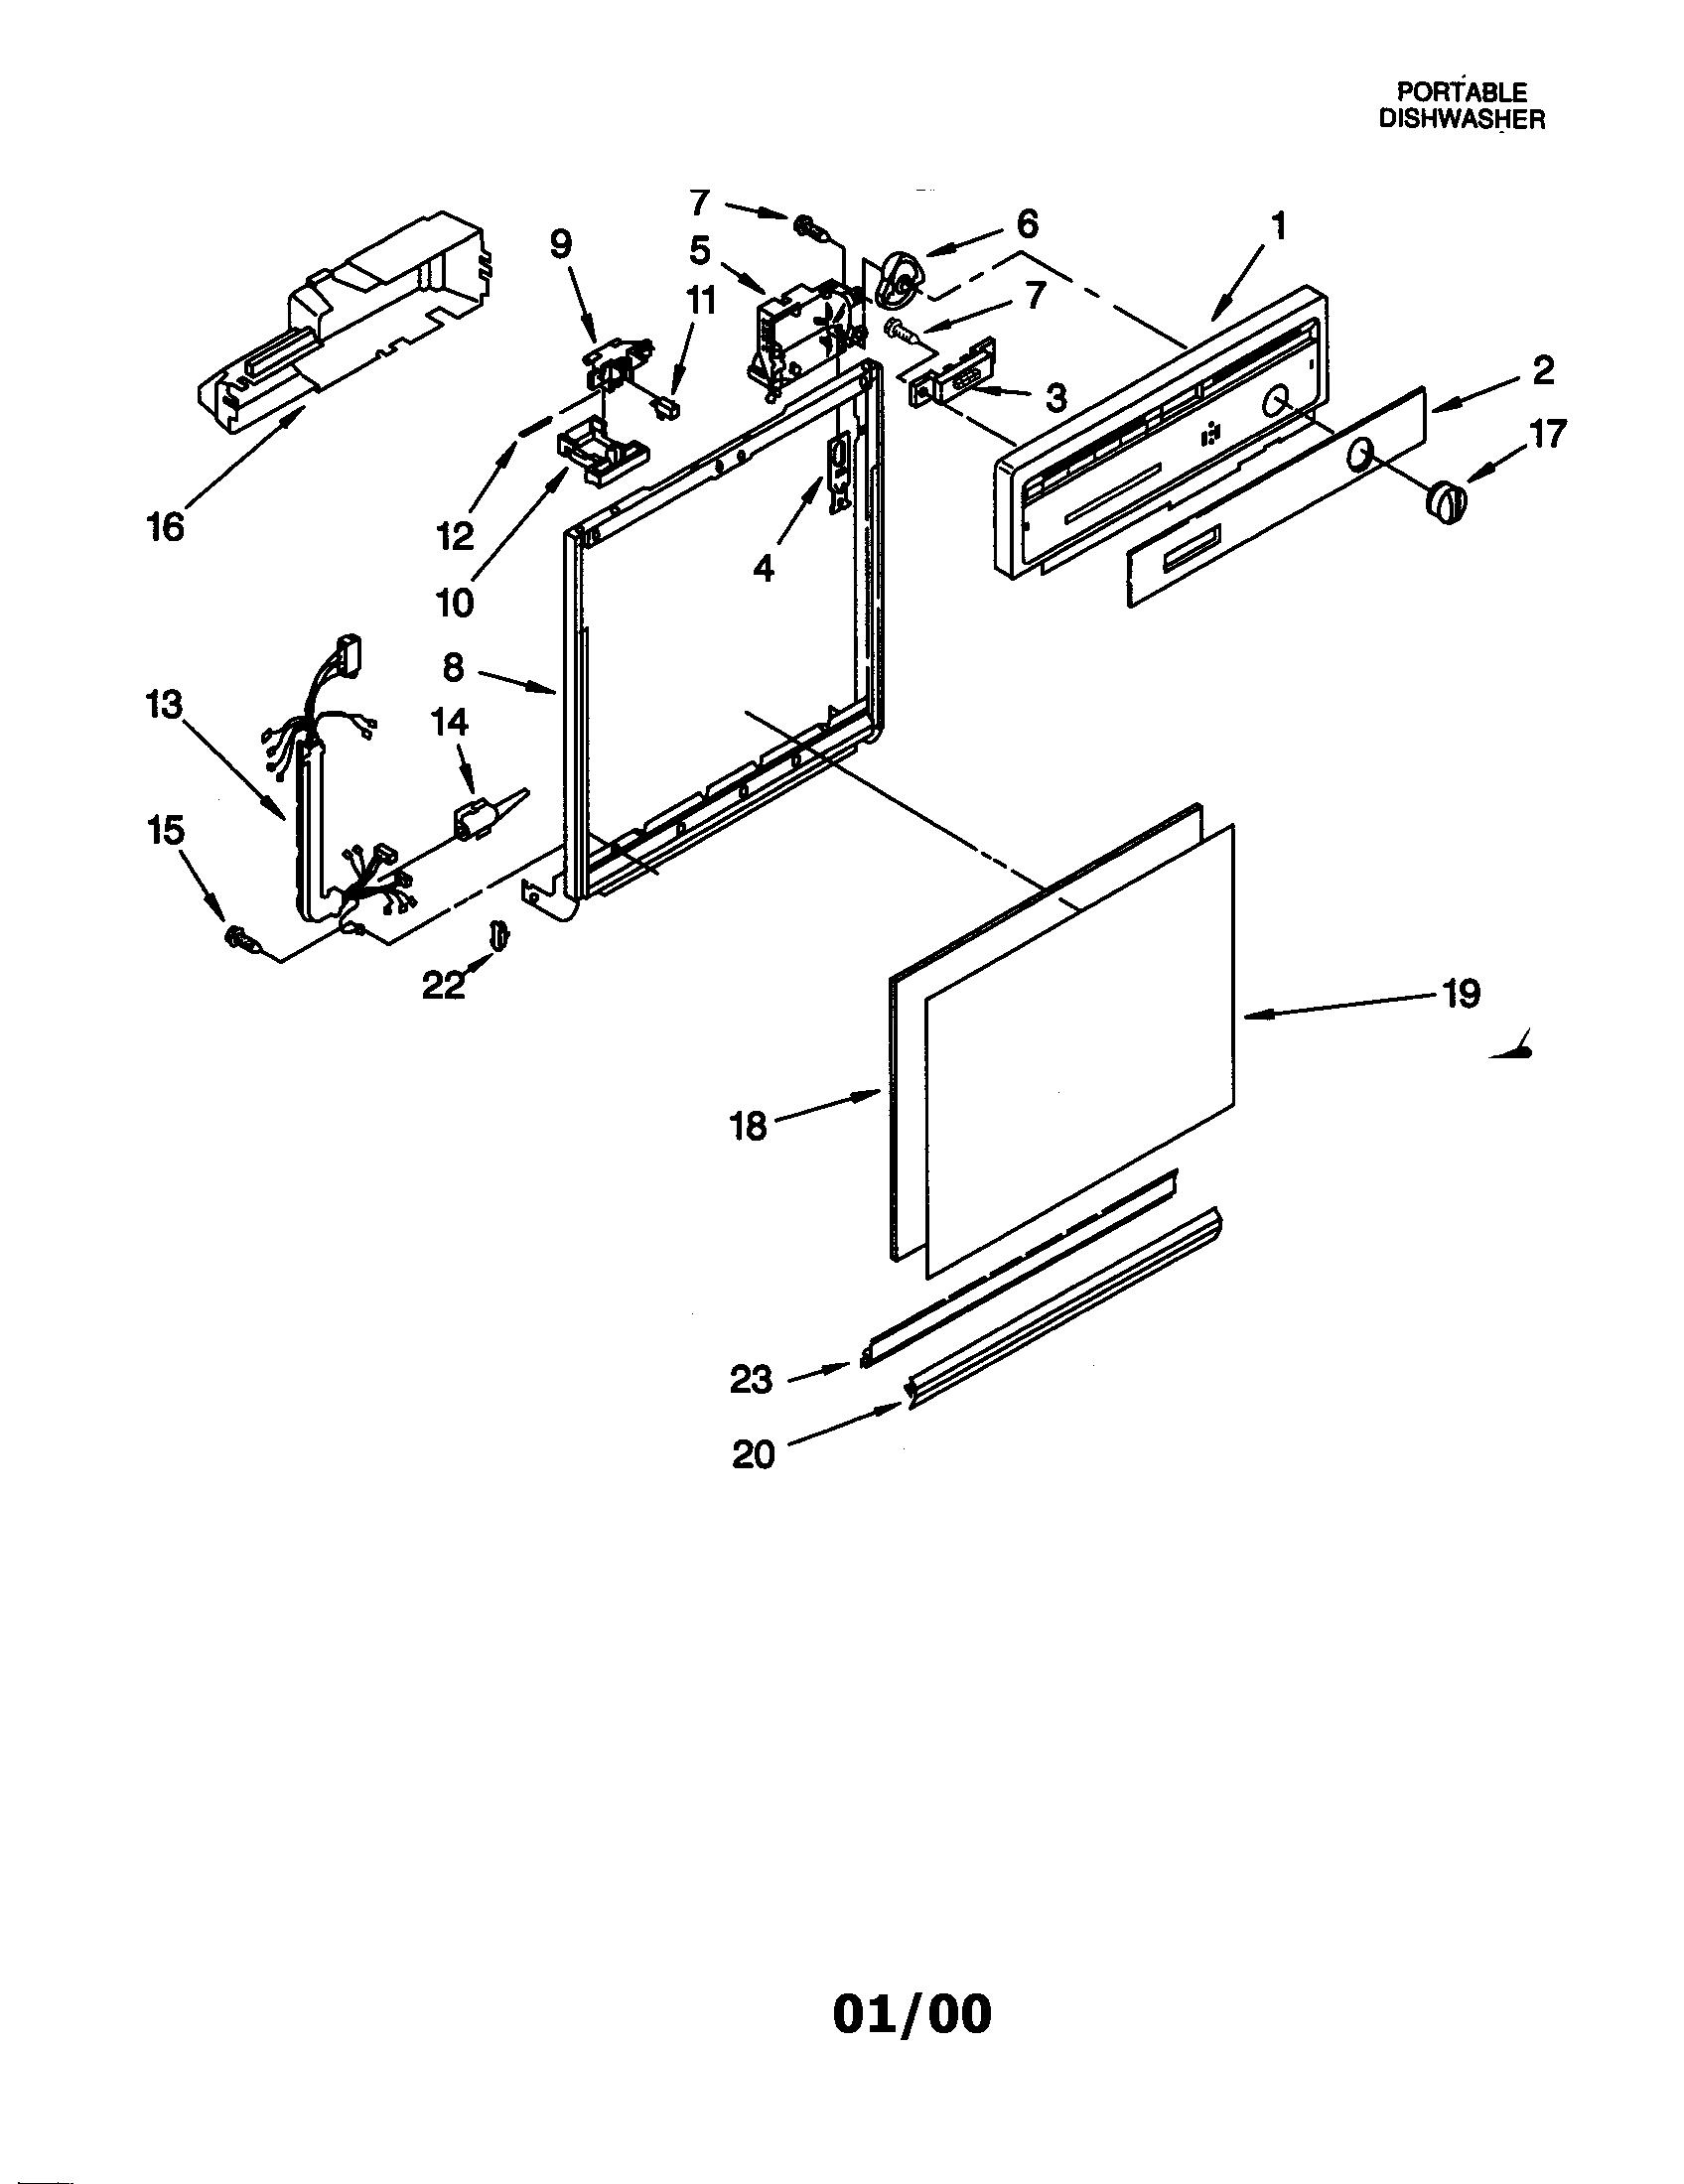 WHIRLPOOL PORTABLE DISHWASHER Parts  Model DP840DWGX1  Sears PartsDirect